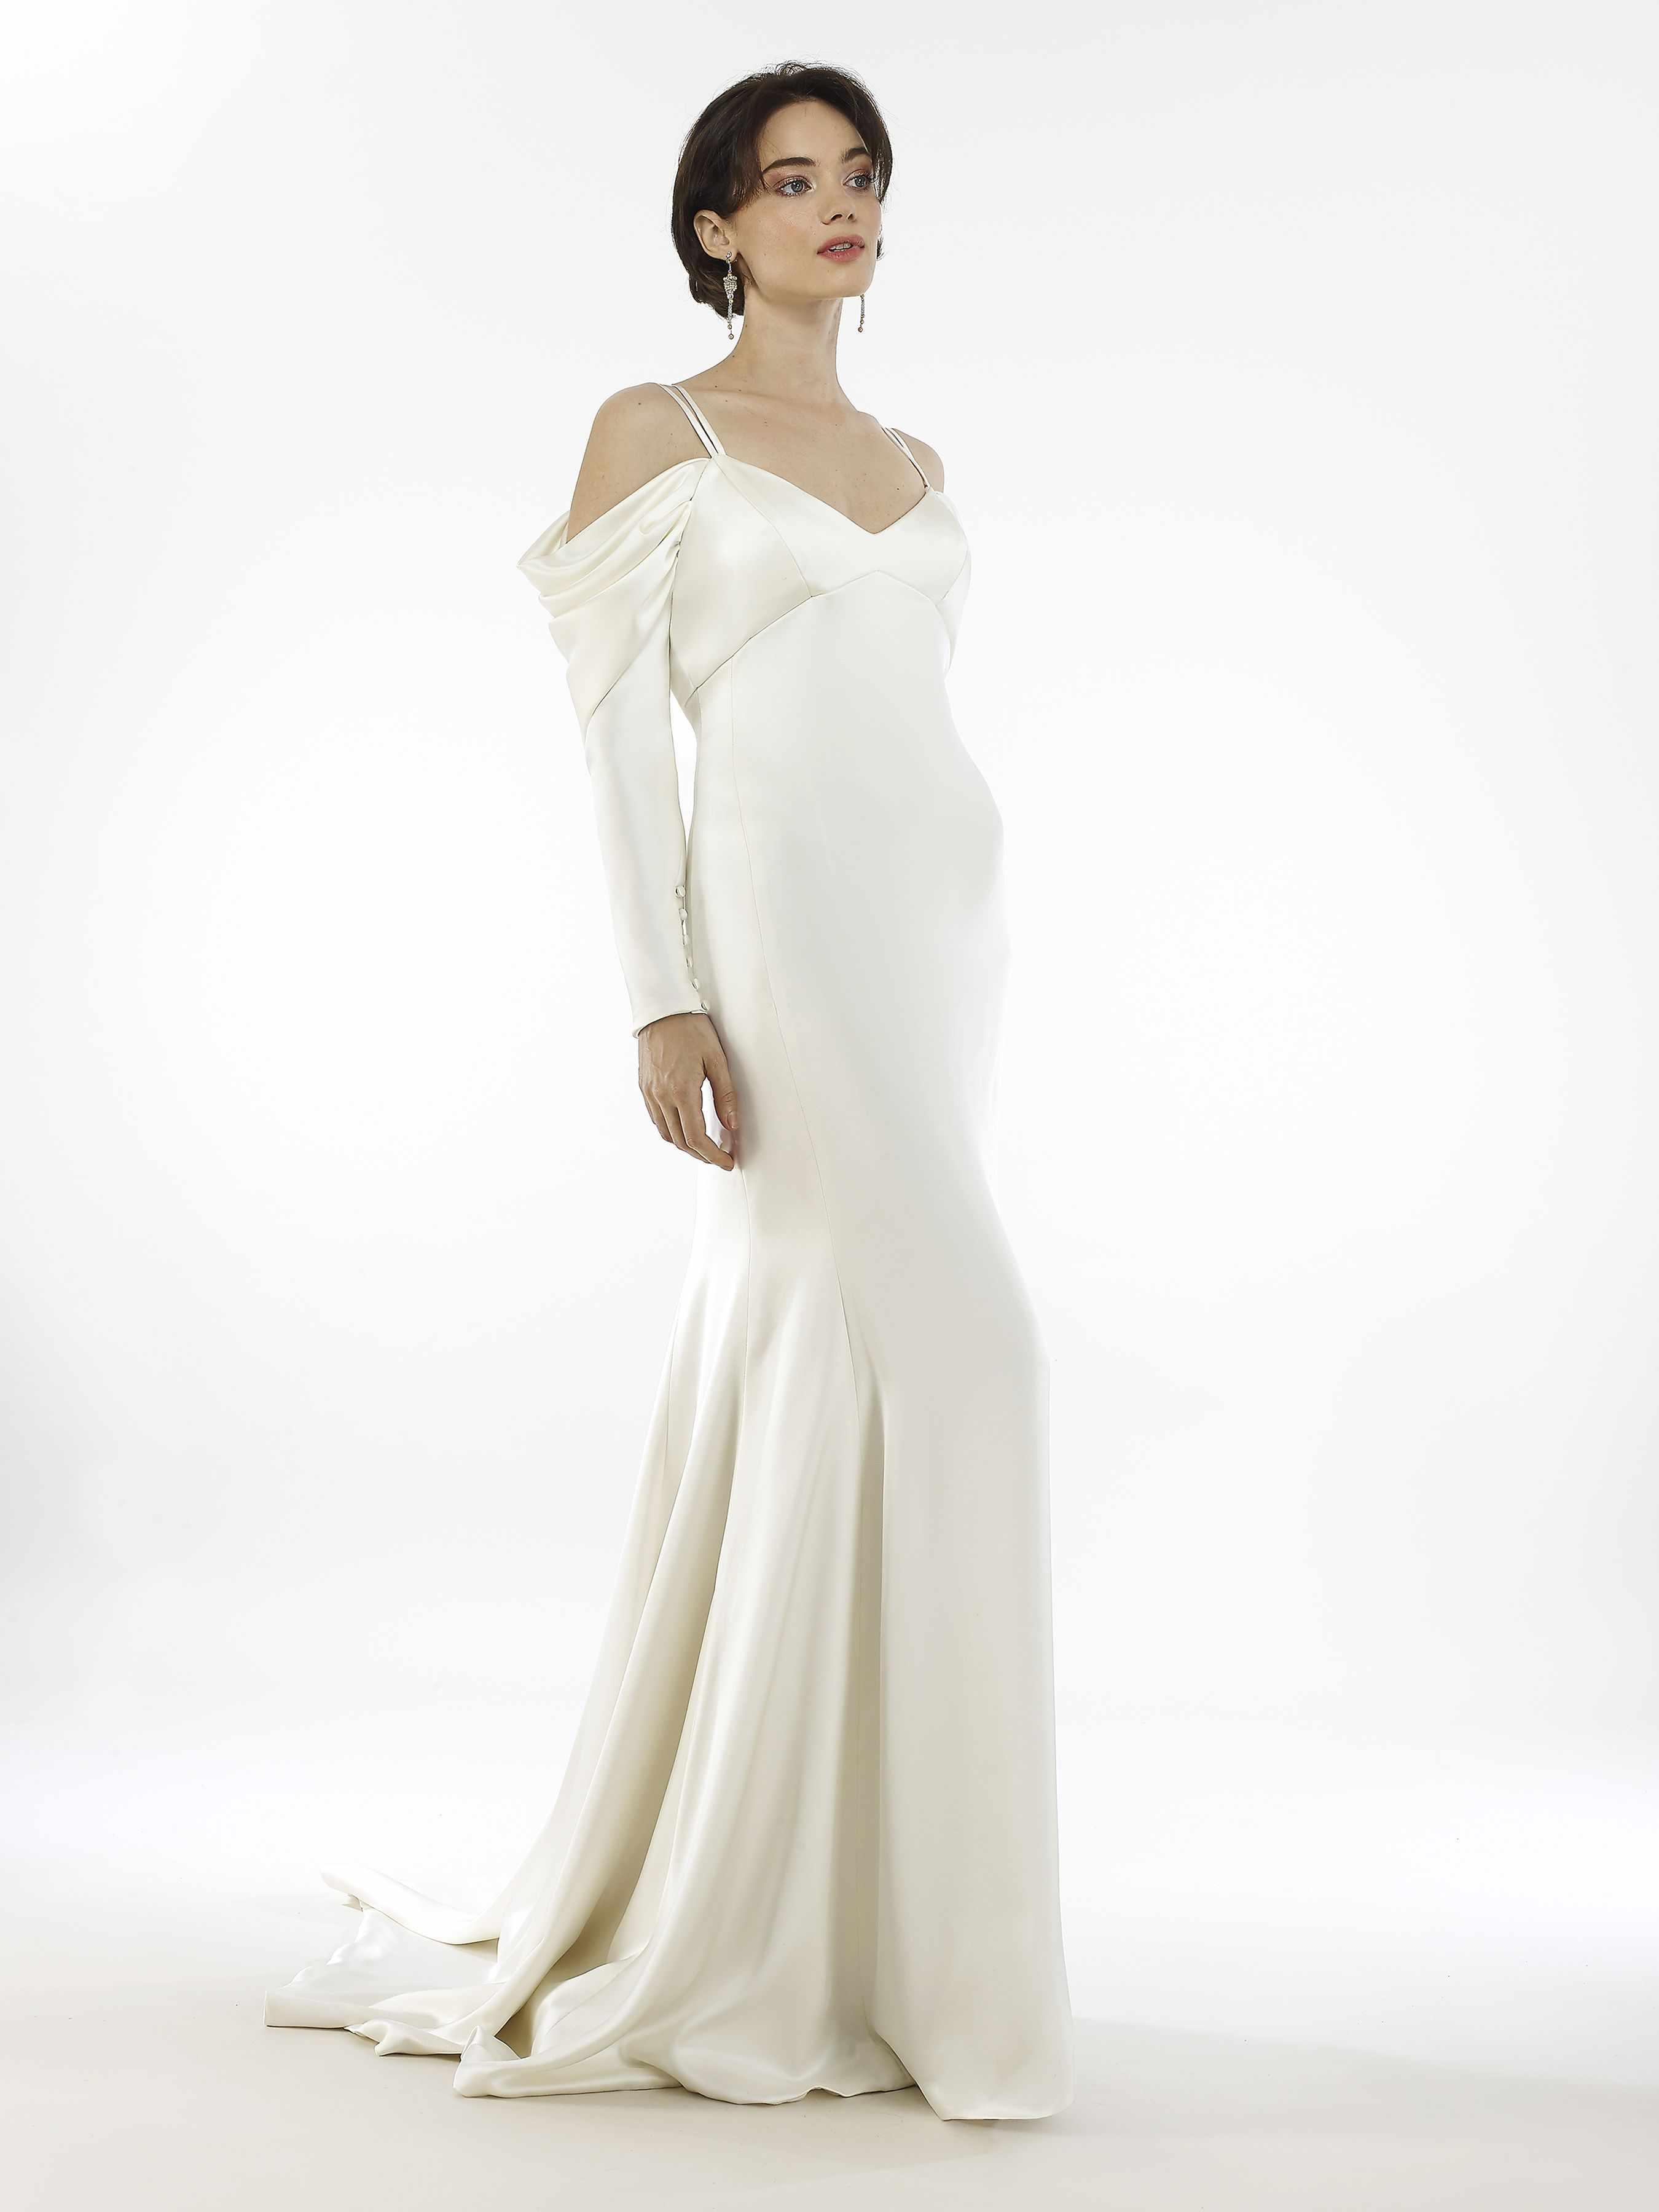 Model in cold-shoulder long-sleeved soft mermaid gown